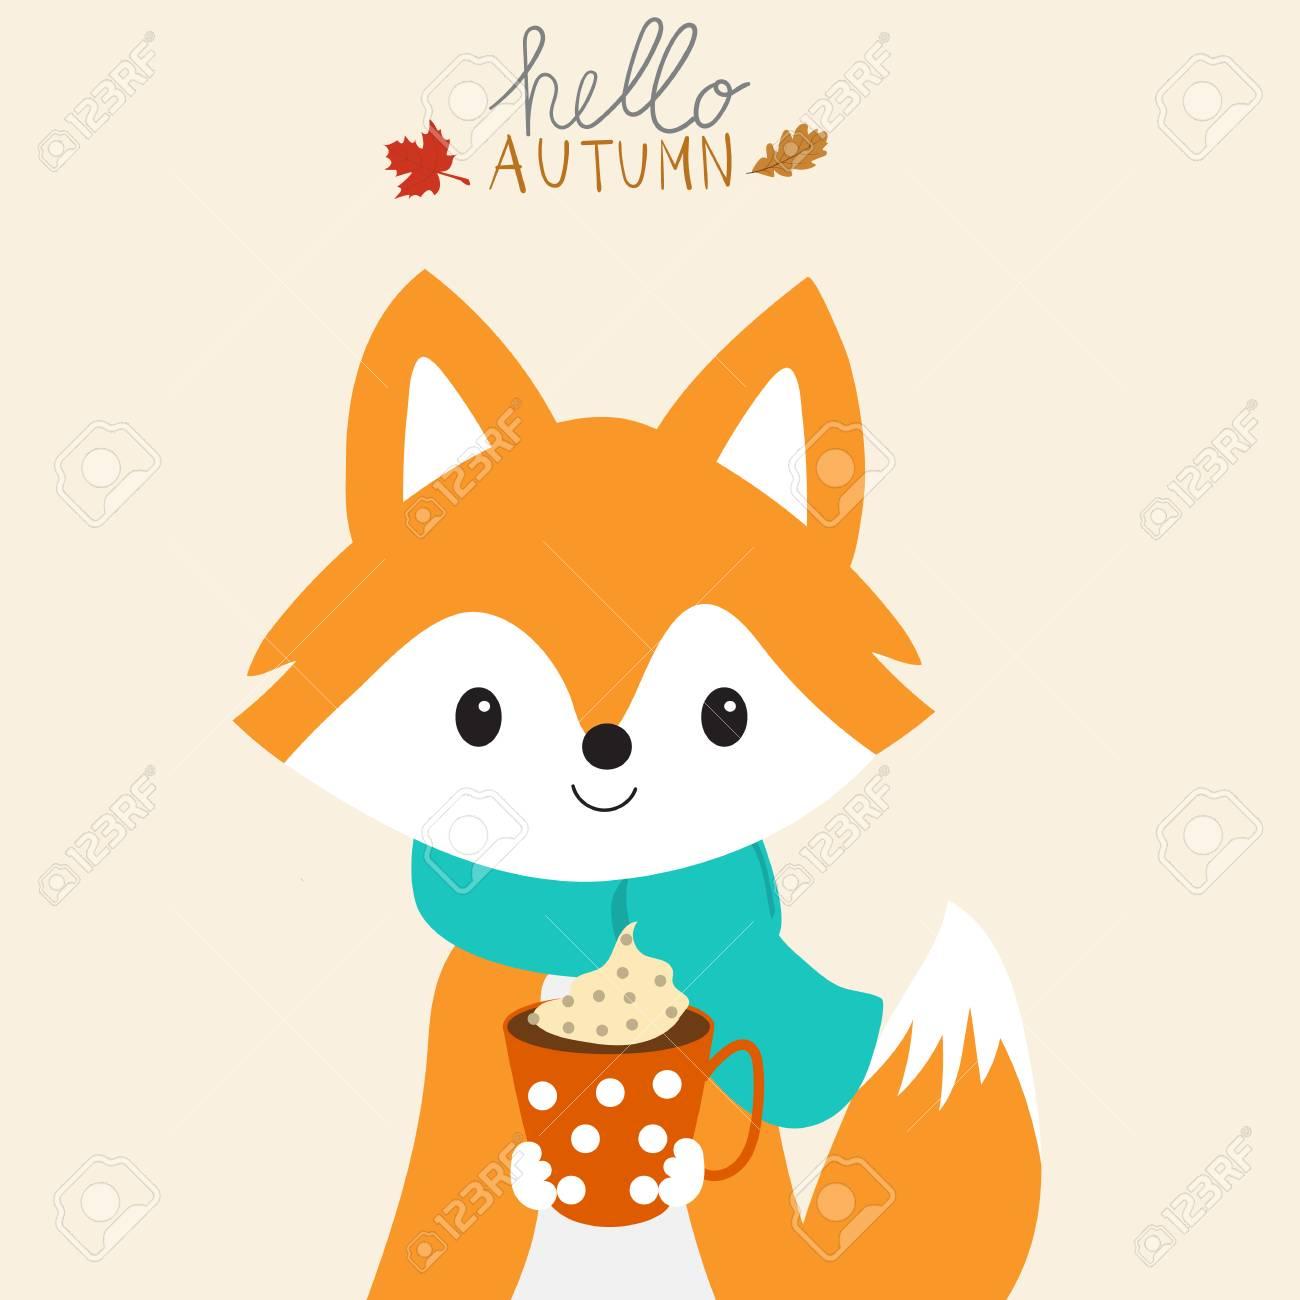 Little fox with a cup of warm milk autumn season.illustration EPS 10. - 88078709